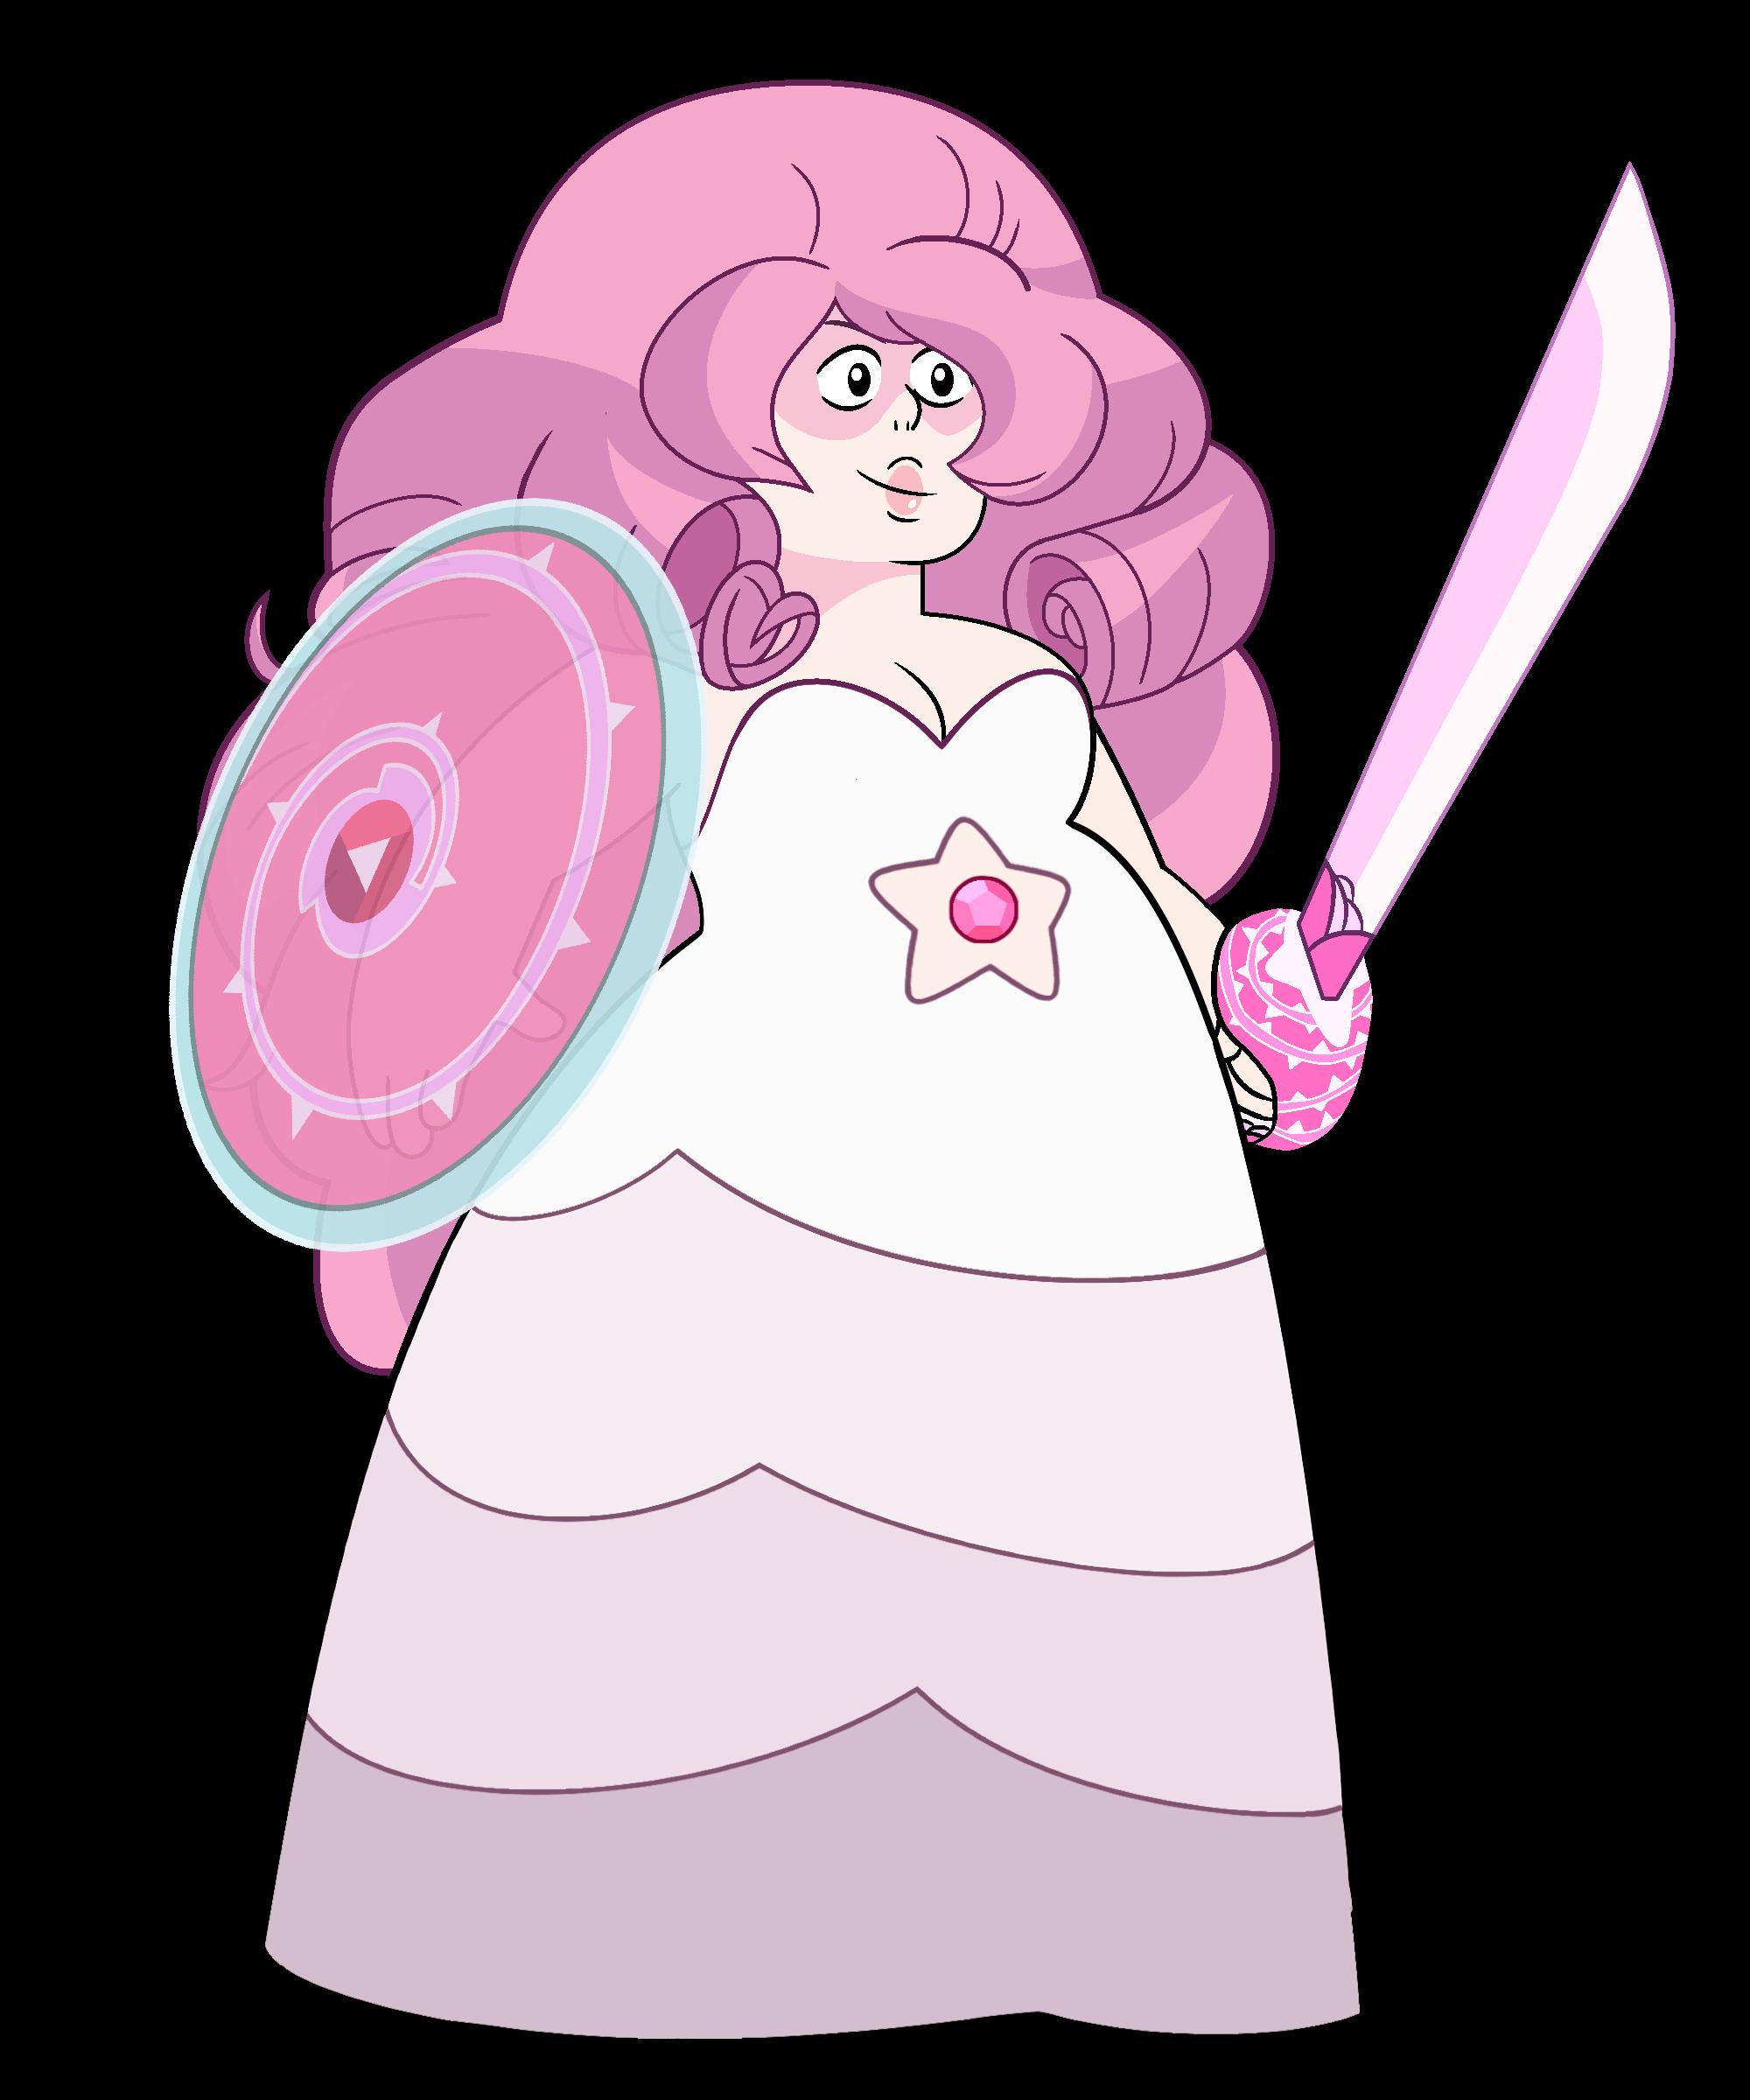 9290de14b Rose Quartz | Steven Universe Wiki | FANDOM powered by Wikia